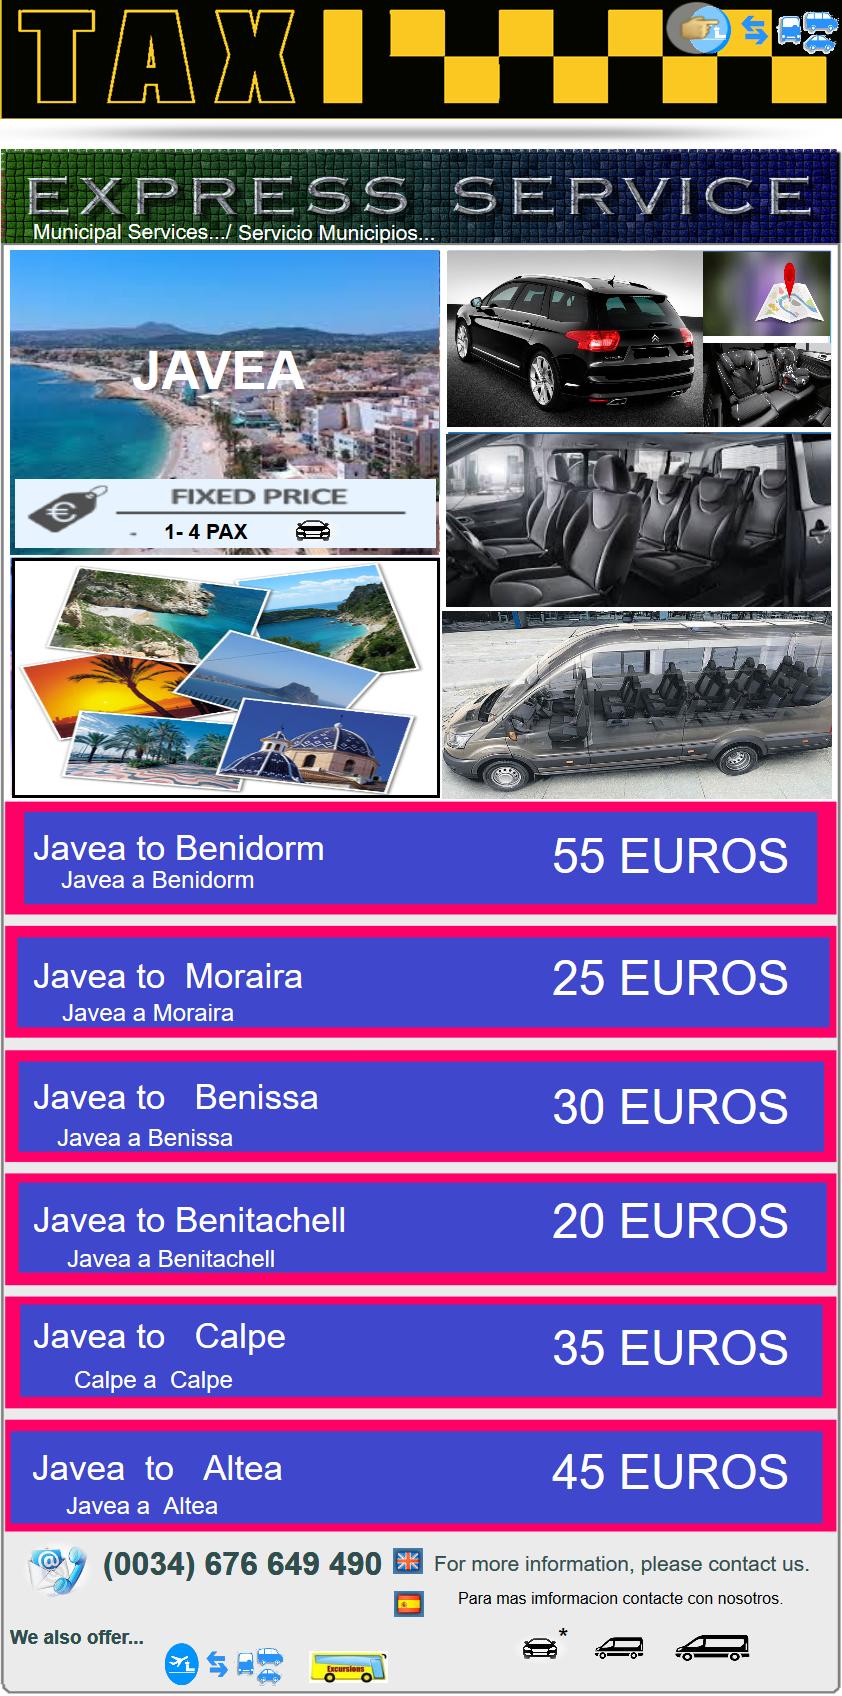 EXPRESS SERVICE - Javea-,